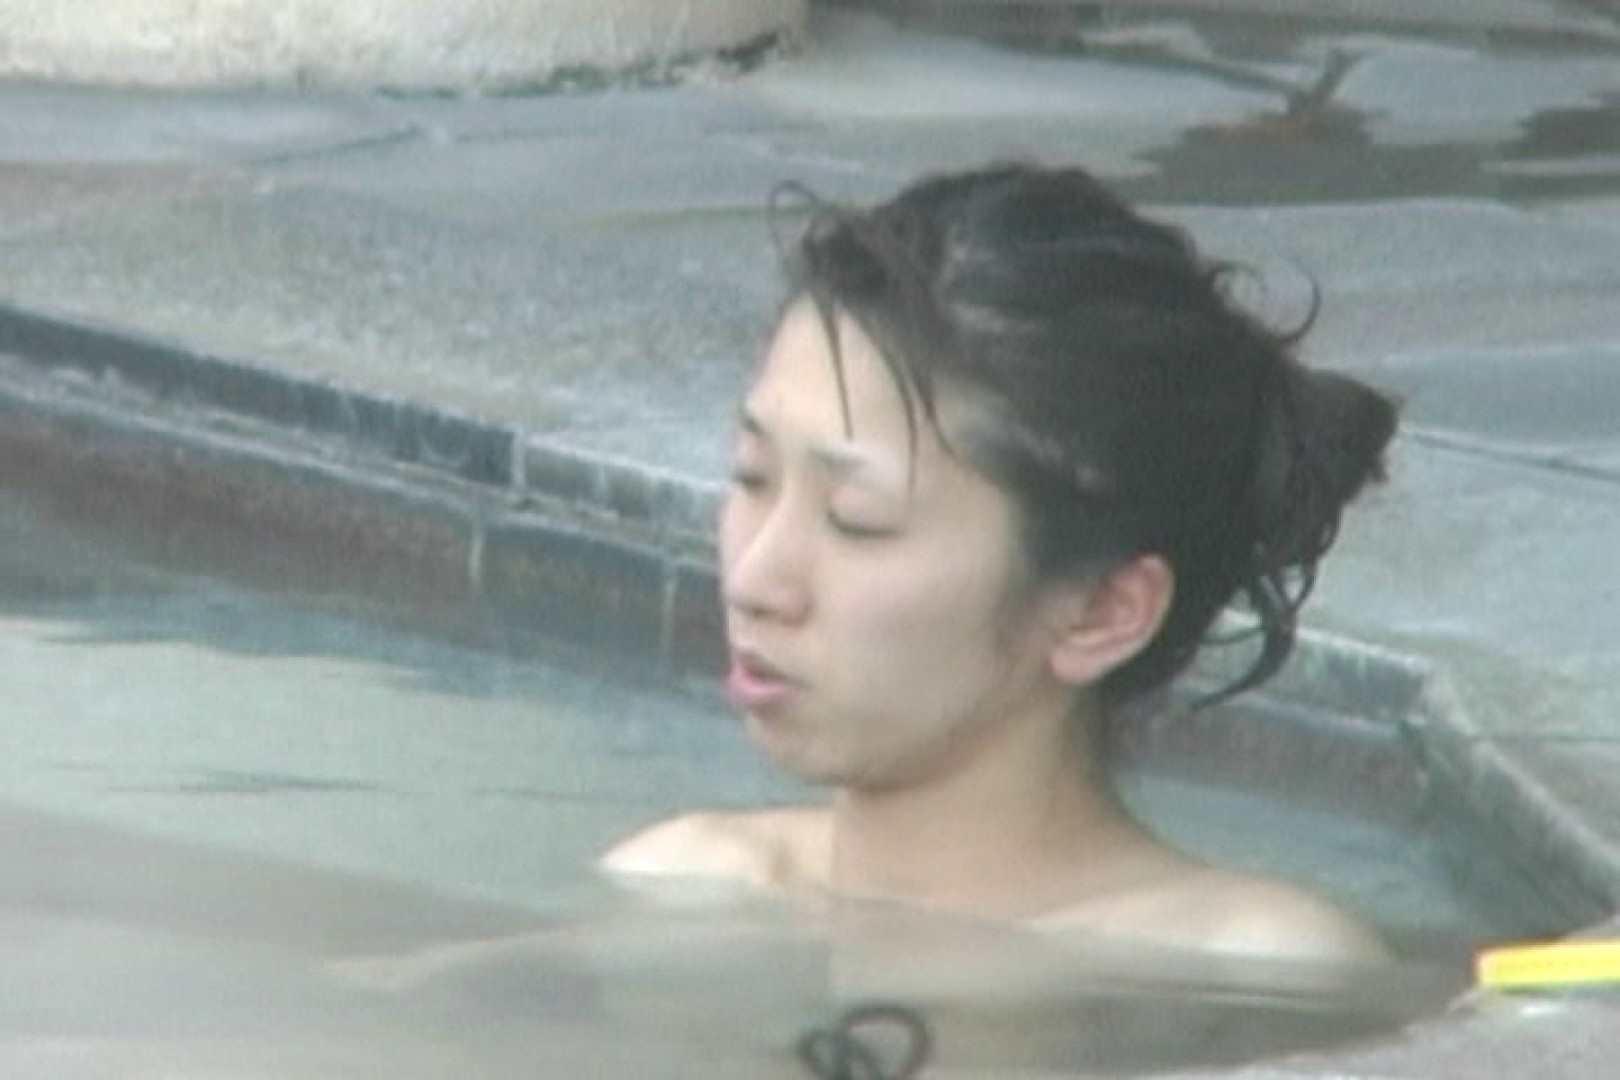 Aquaな露天風呂Vol.588 0  41連発 35